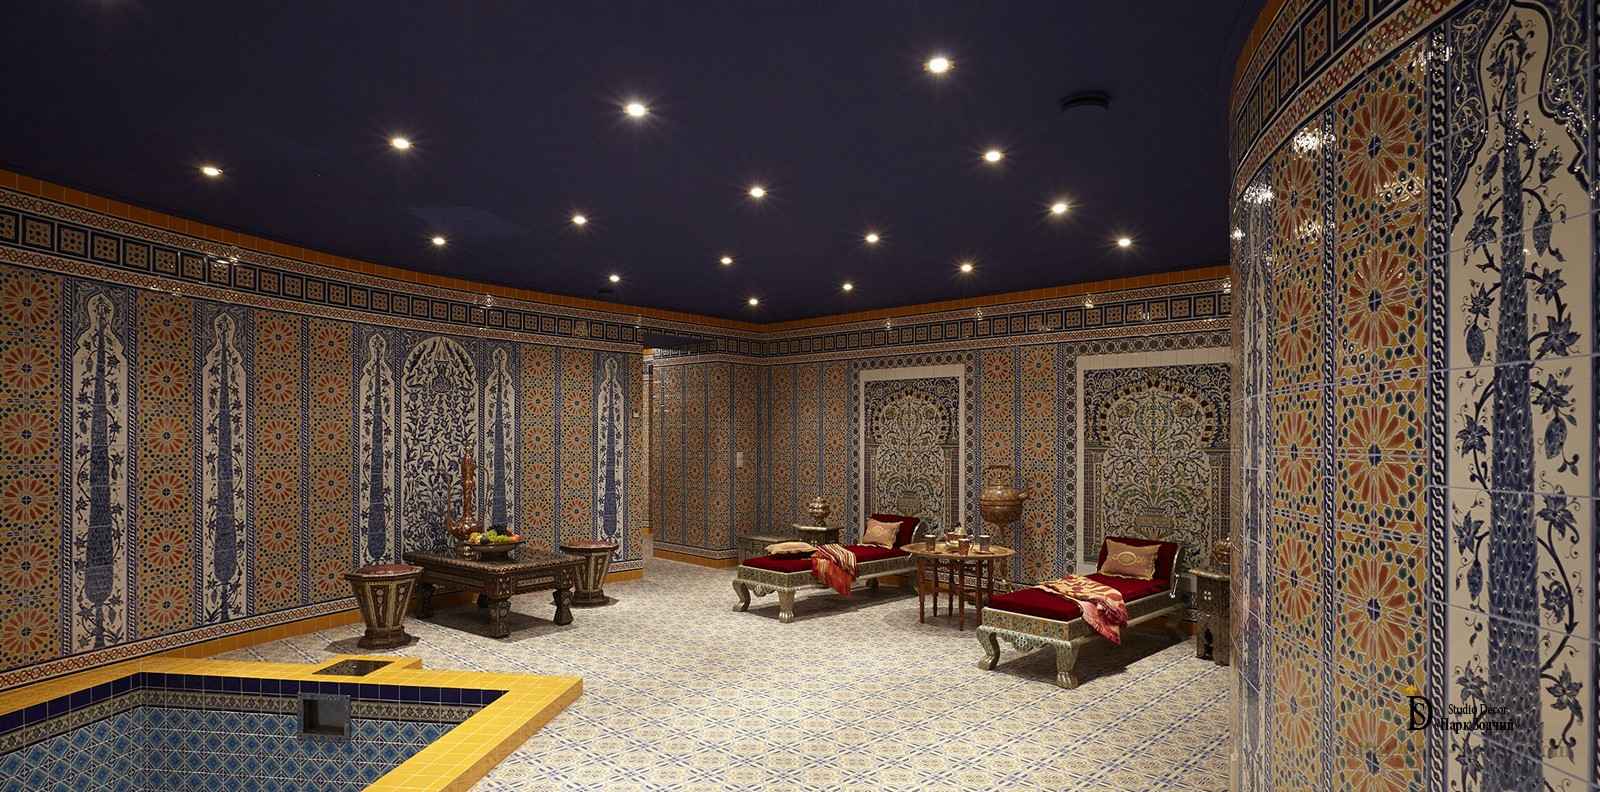 Богато декорированный интерьер хаммама